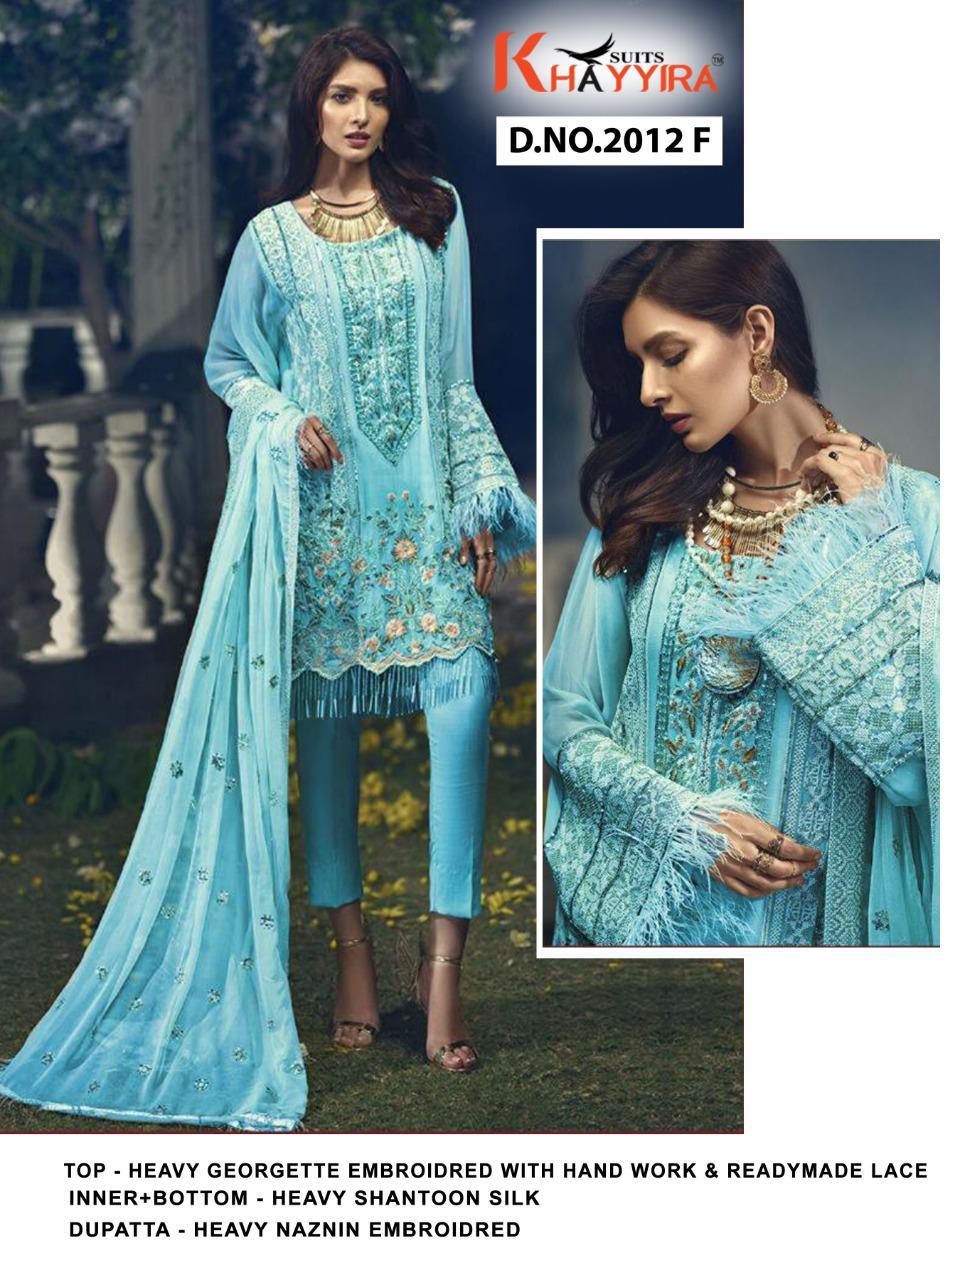 Khayyira Cross Stitch Salwar Suit Wholesale Catalog 8 Pcs 5 - Khayyira Cross Stitch Salwar Suit Wholesale Catalog 8 Pcs